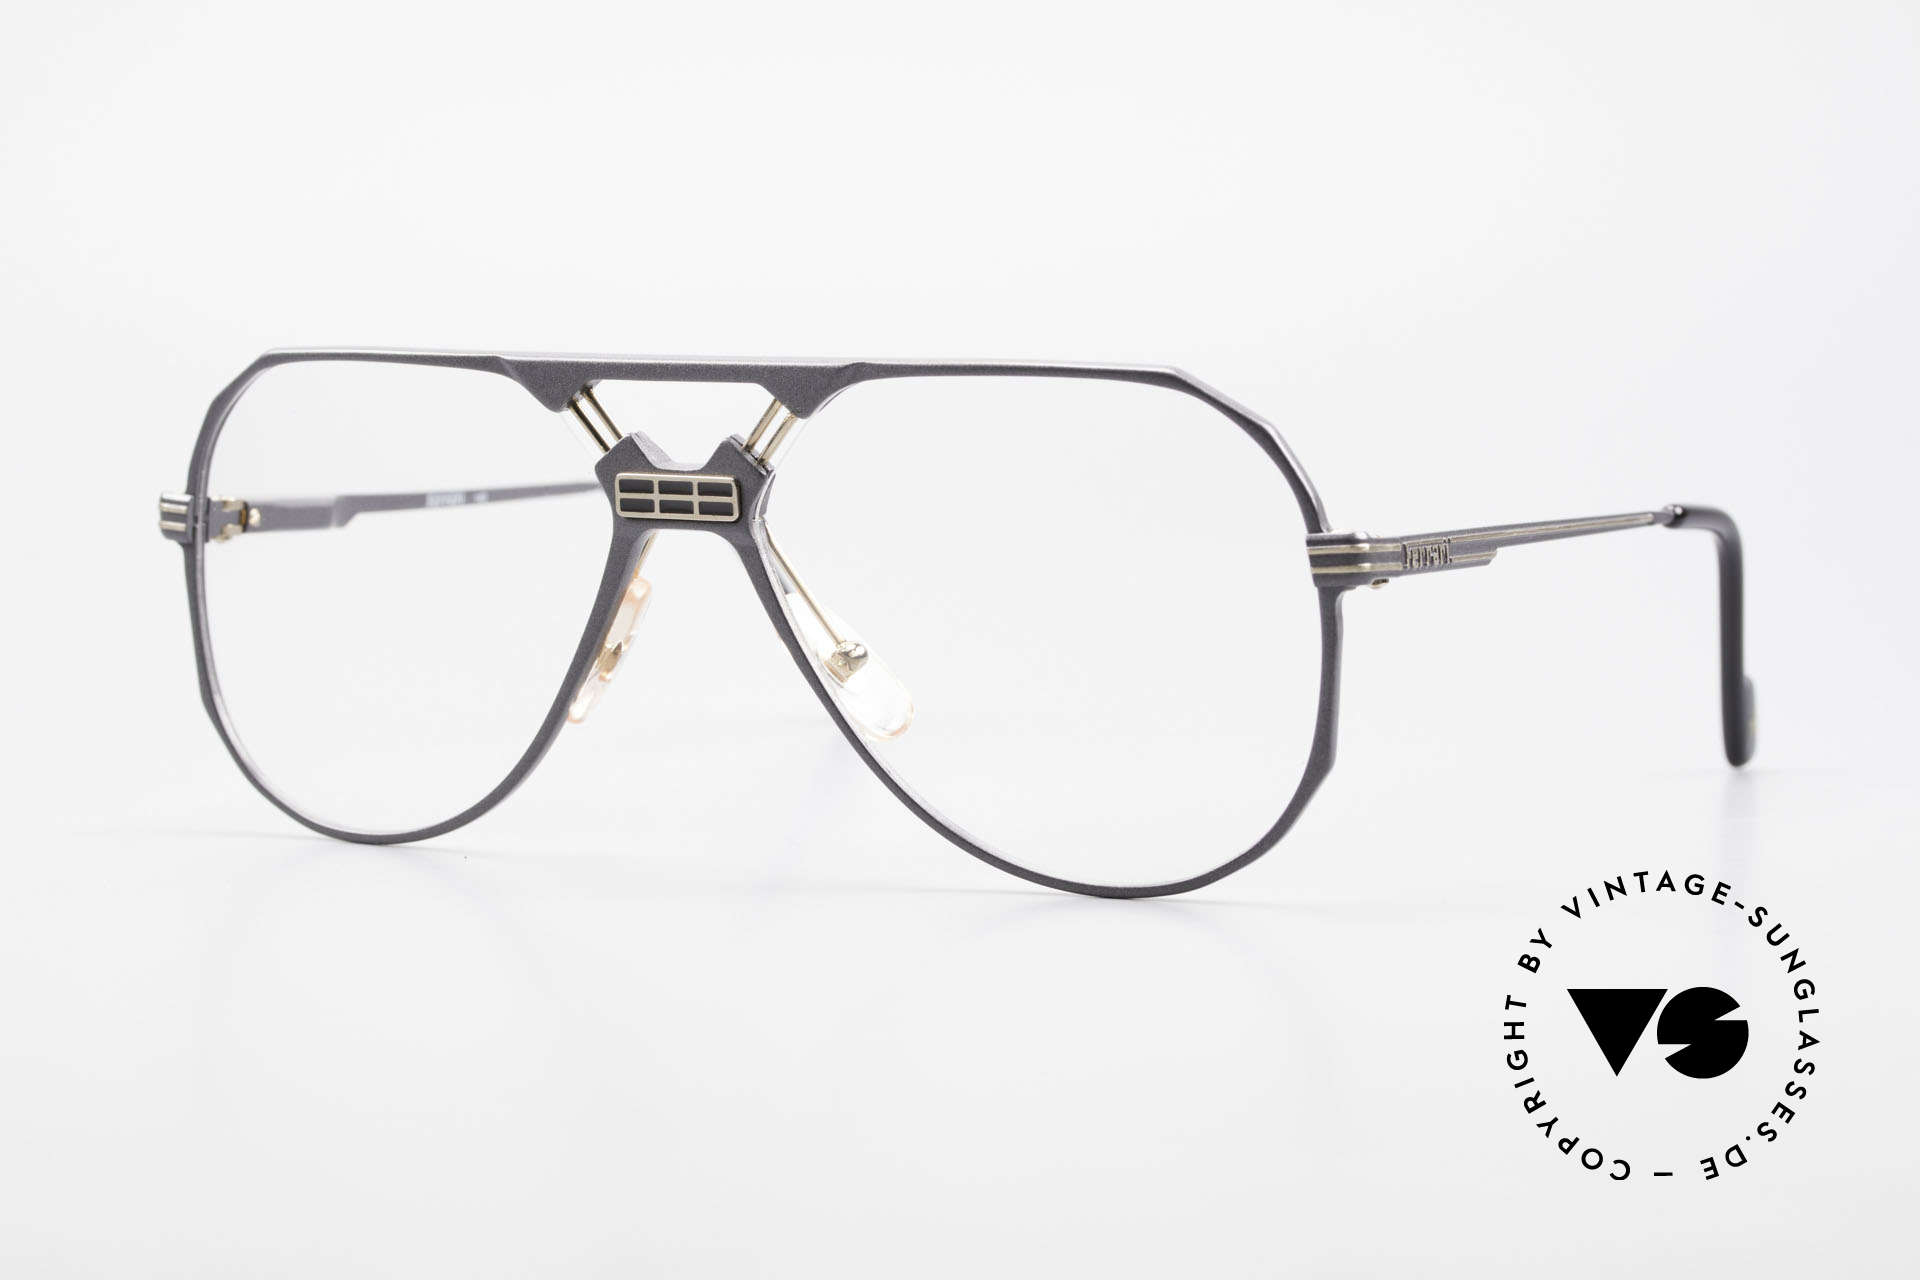 Ferrari F23 Formula 1 Ferrari Glasses Men, very masculine Ferrari Formula 1 aviator glasses, Made for Men